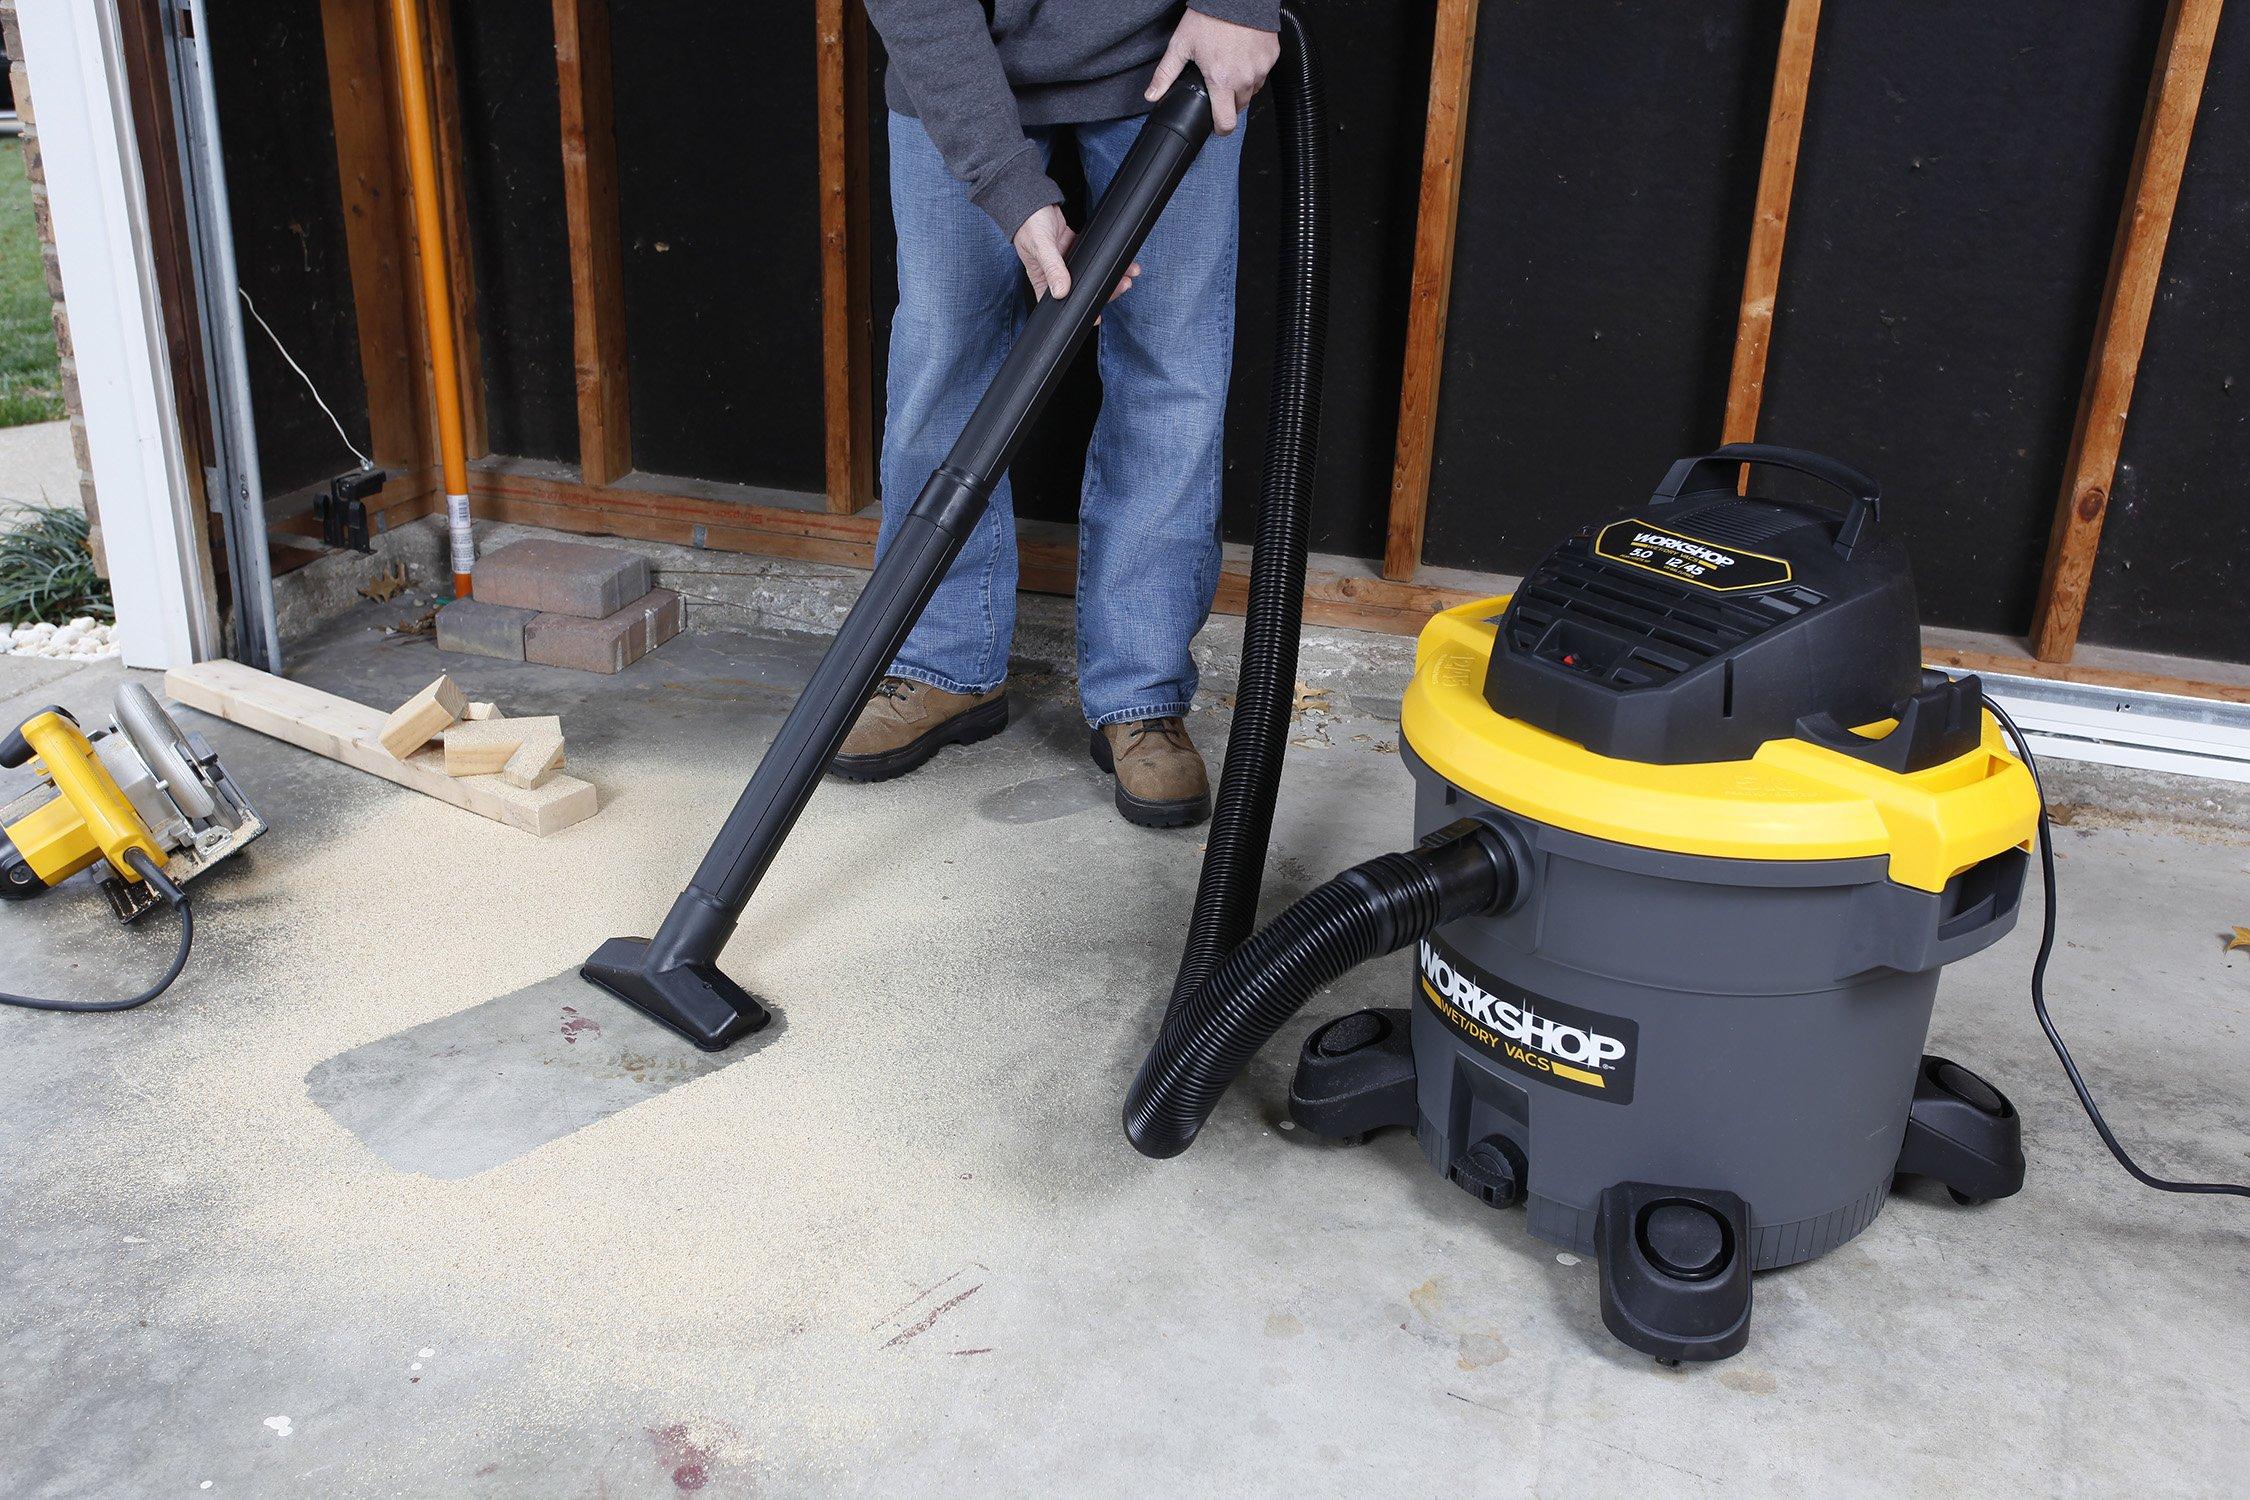 WORKSHOP Wet Dry Vac WS1200VA Heavy Duty General Purpose Wet Dry Vacuum Cleaner, 12-Gallon Shop Vacuum Cleaner, 5.0 Peak HP Wet And Dry Vacuum by Workshop (Image #4)